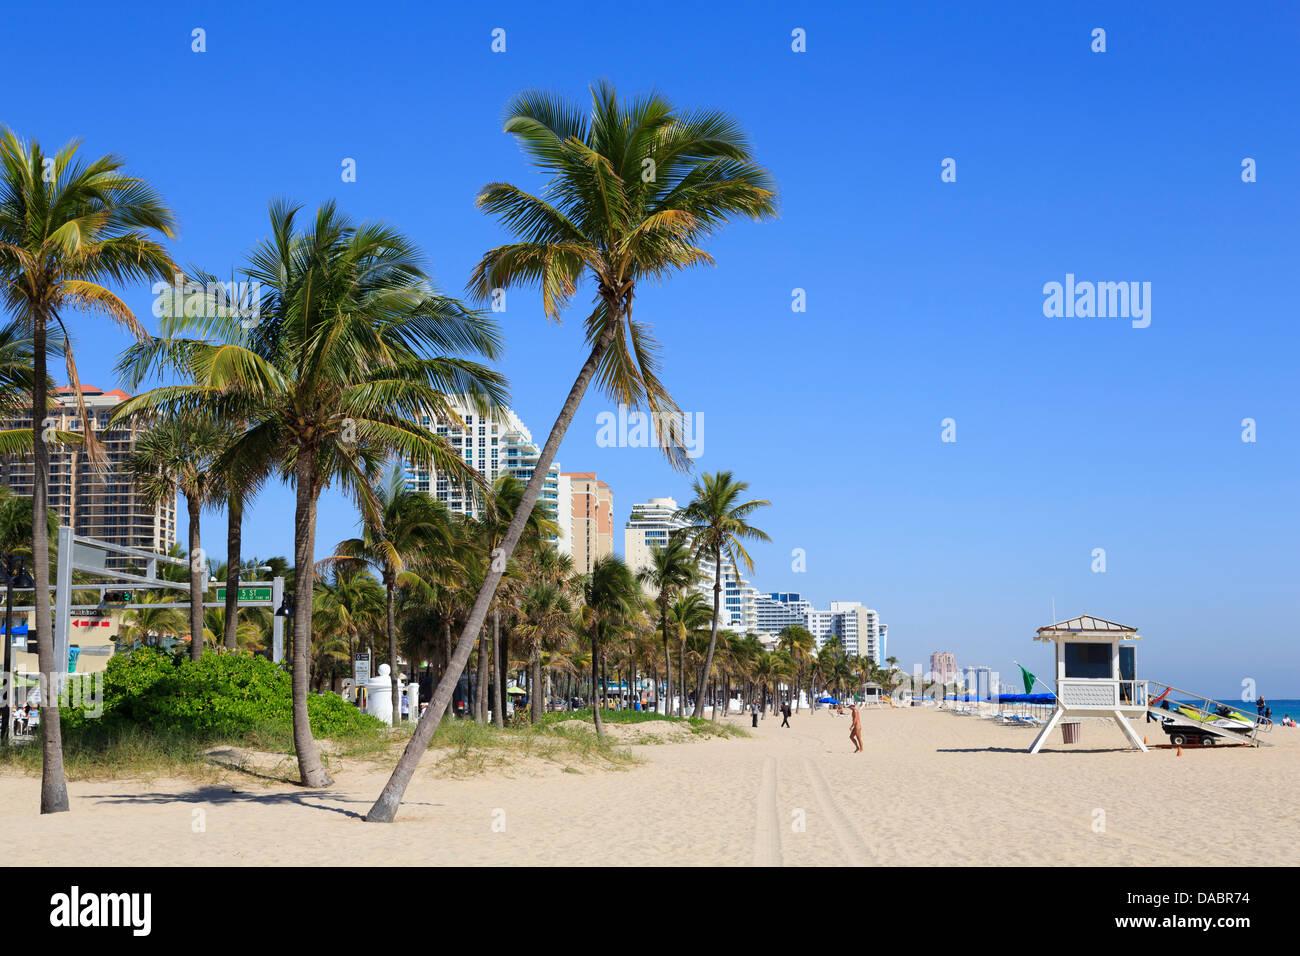 Beach on Ocean Boulevard, Fort Lauderdale, Florida, United States of America, North America Stock Photo